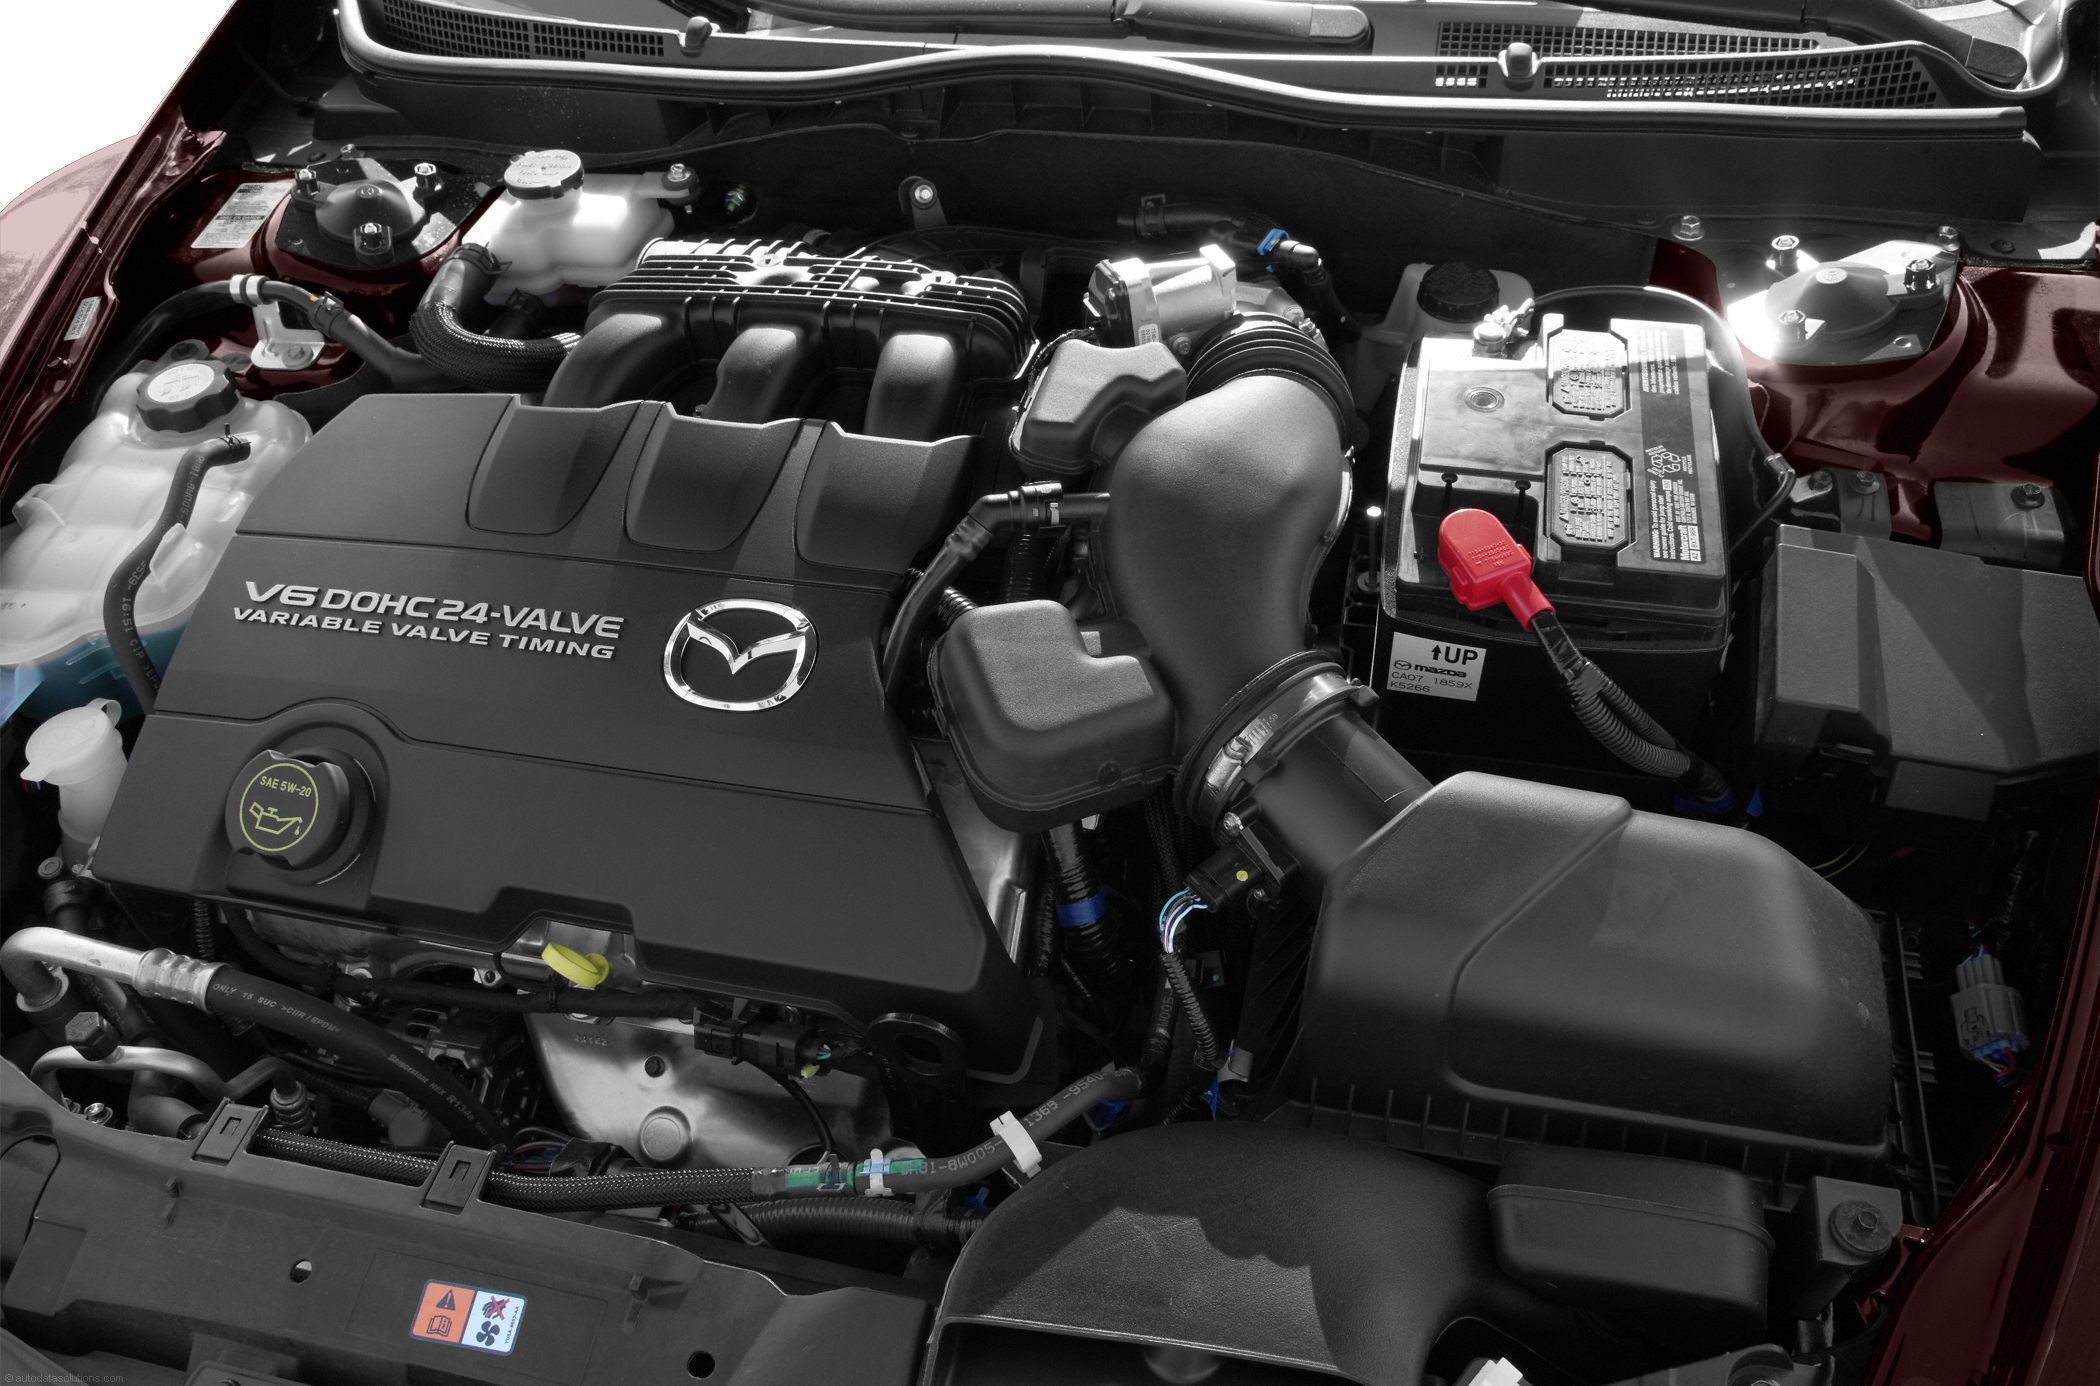 2001 Mazda B4000 #Used #Engine: Description: Gas Engine 4.0, 6 ...